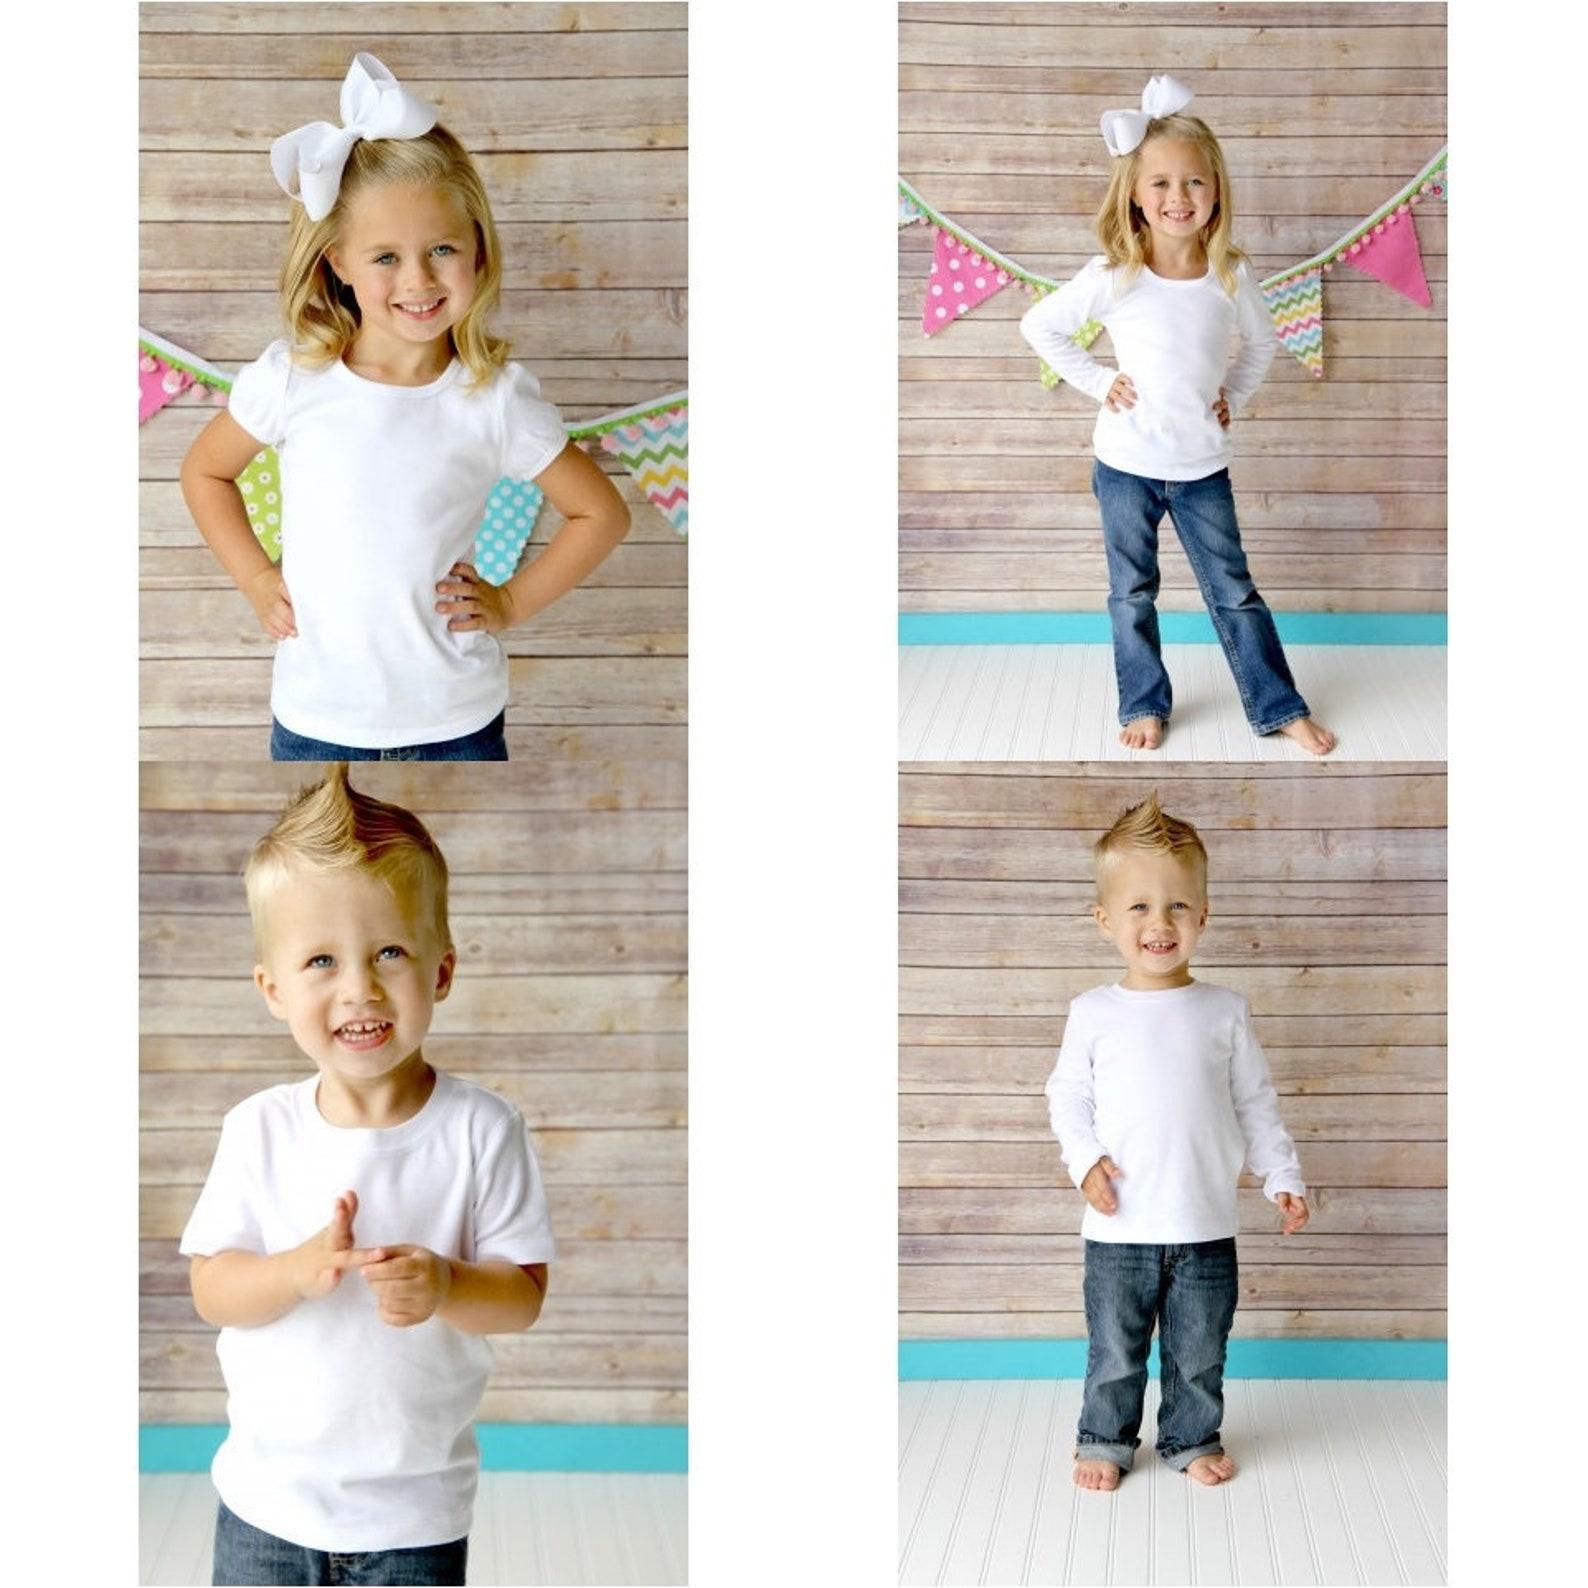 ballerina, dancer, ballet shoes, dance girl embroidered bodysuit, embroidered toddler t-shirt, embroidered t-shirt, baby shower